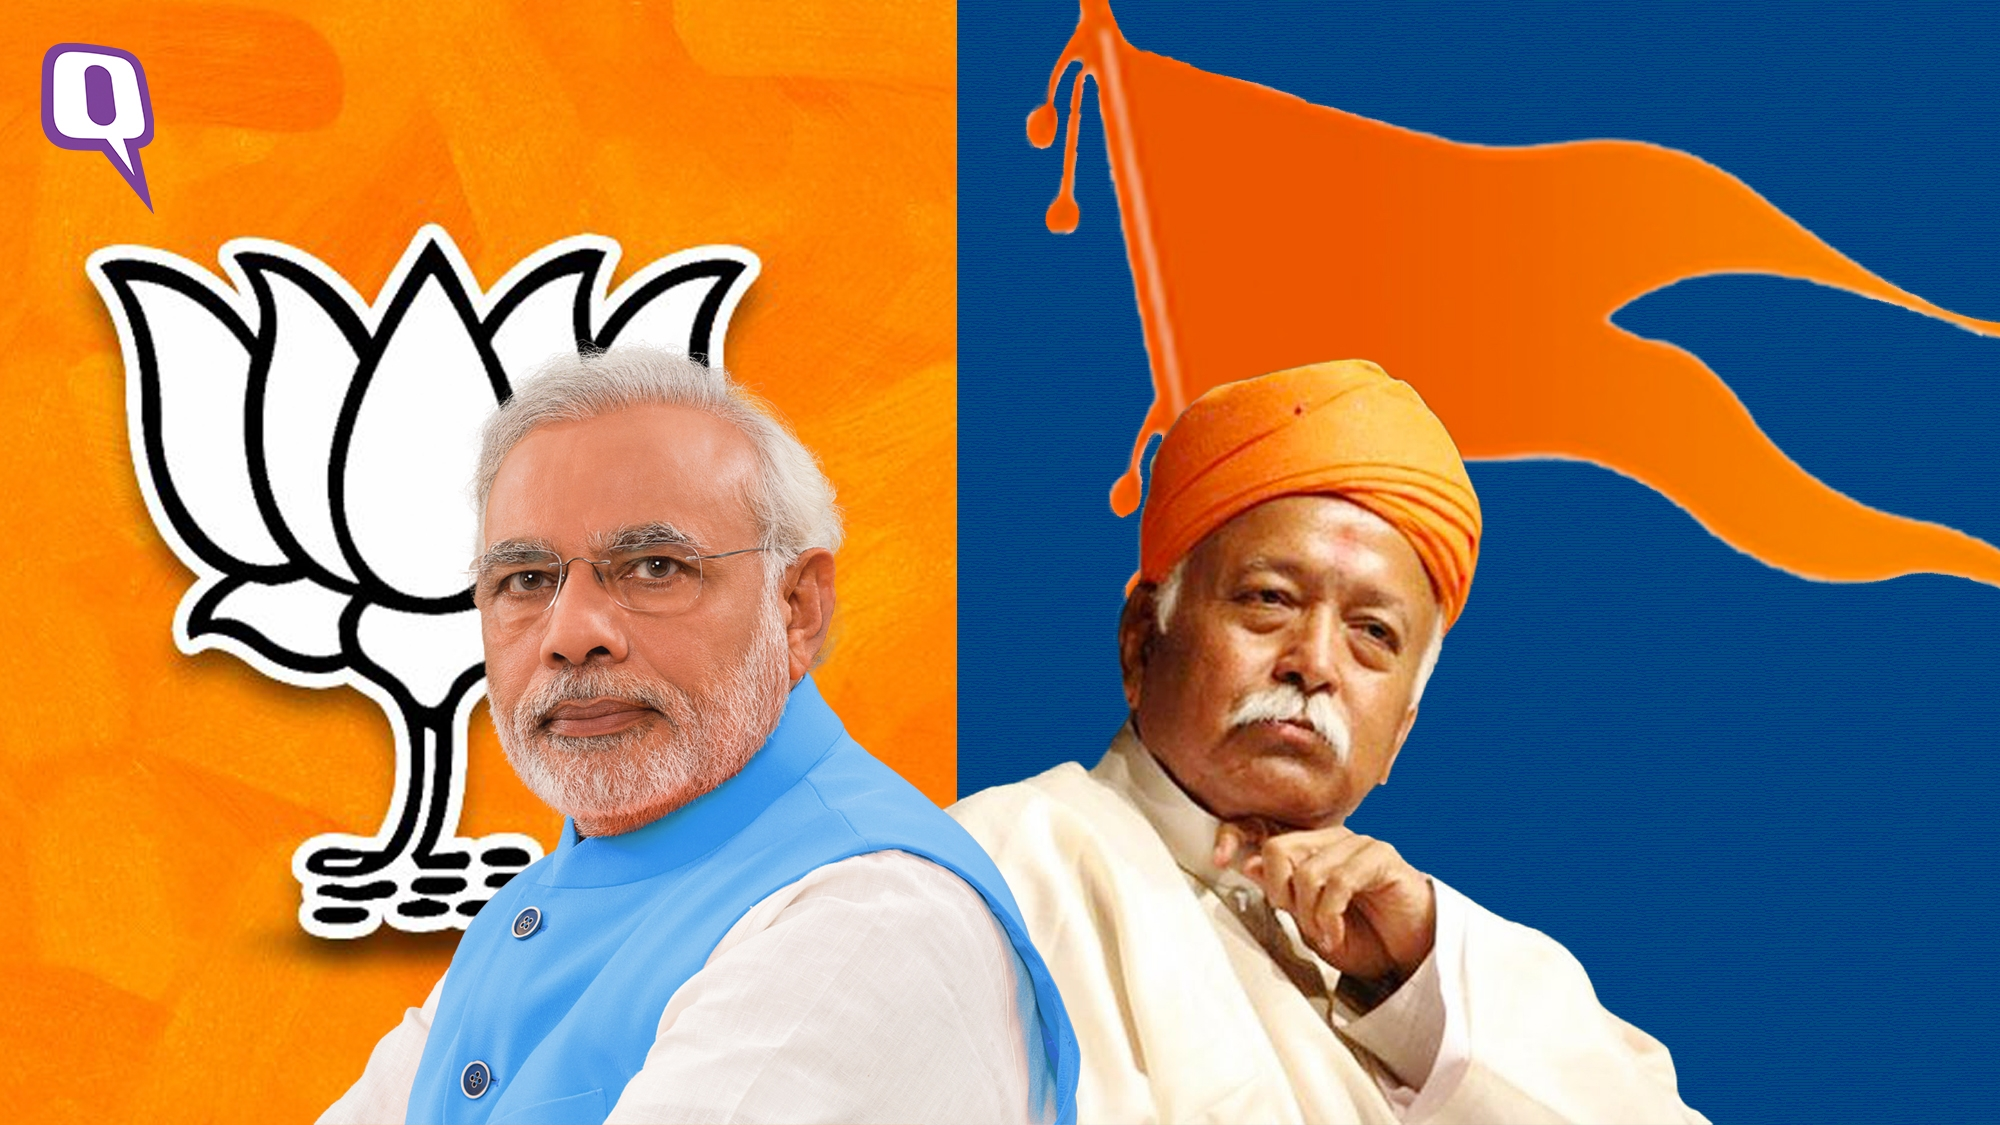 Ahead of LS Results, PM Modi to Meet RSS Chief Bhagwat in Nagpur